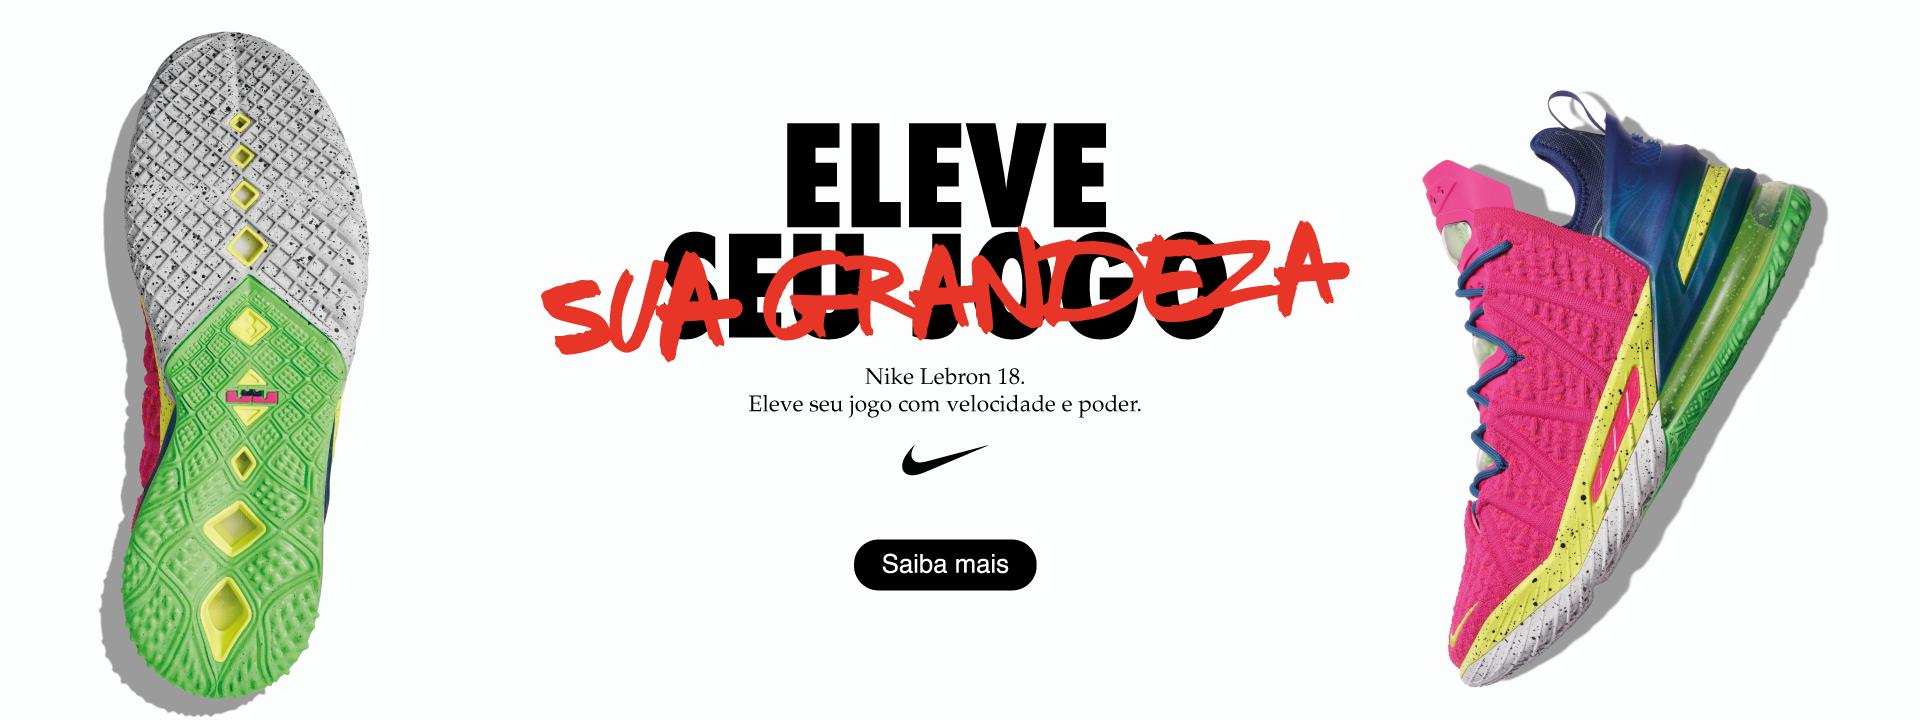 Banner Loja Nike 1920 x 720